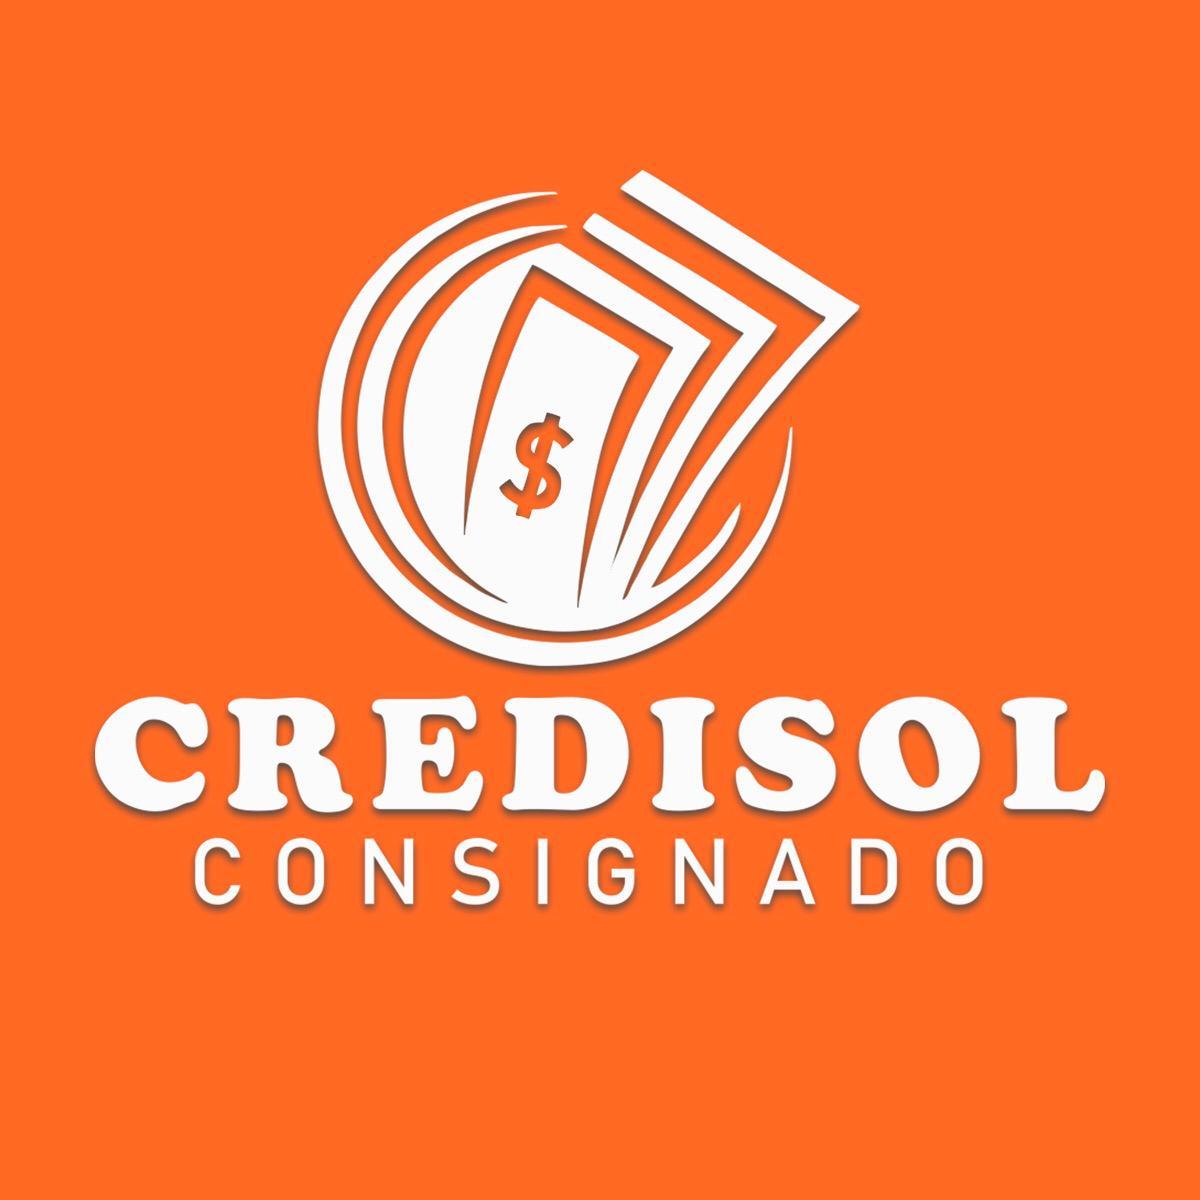 Credsol